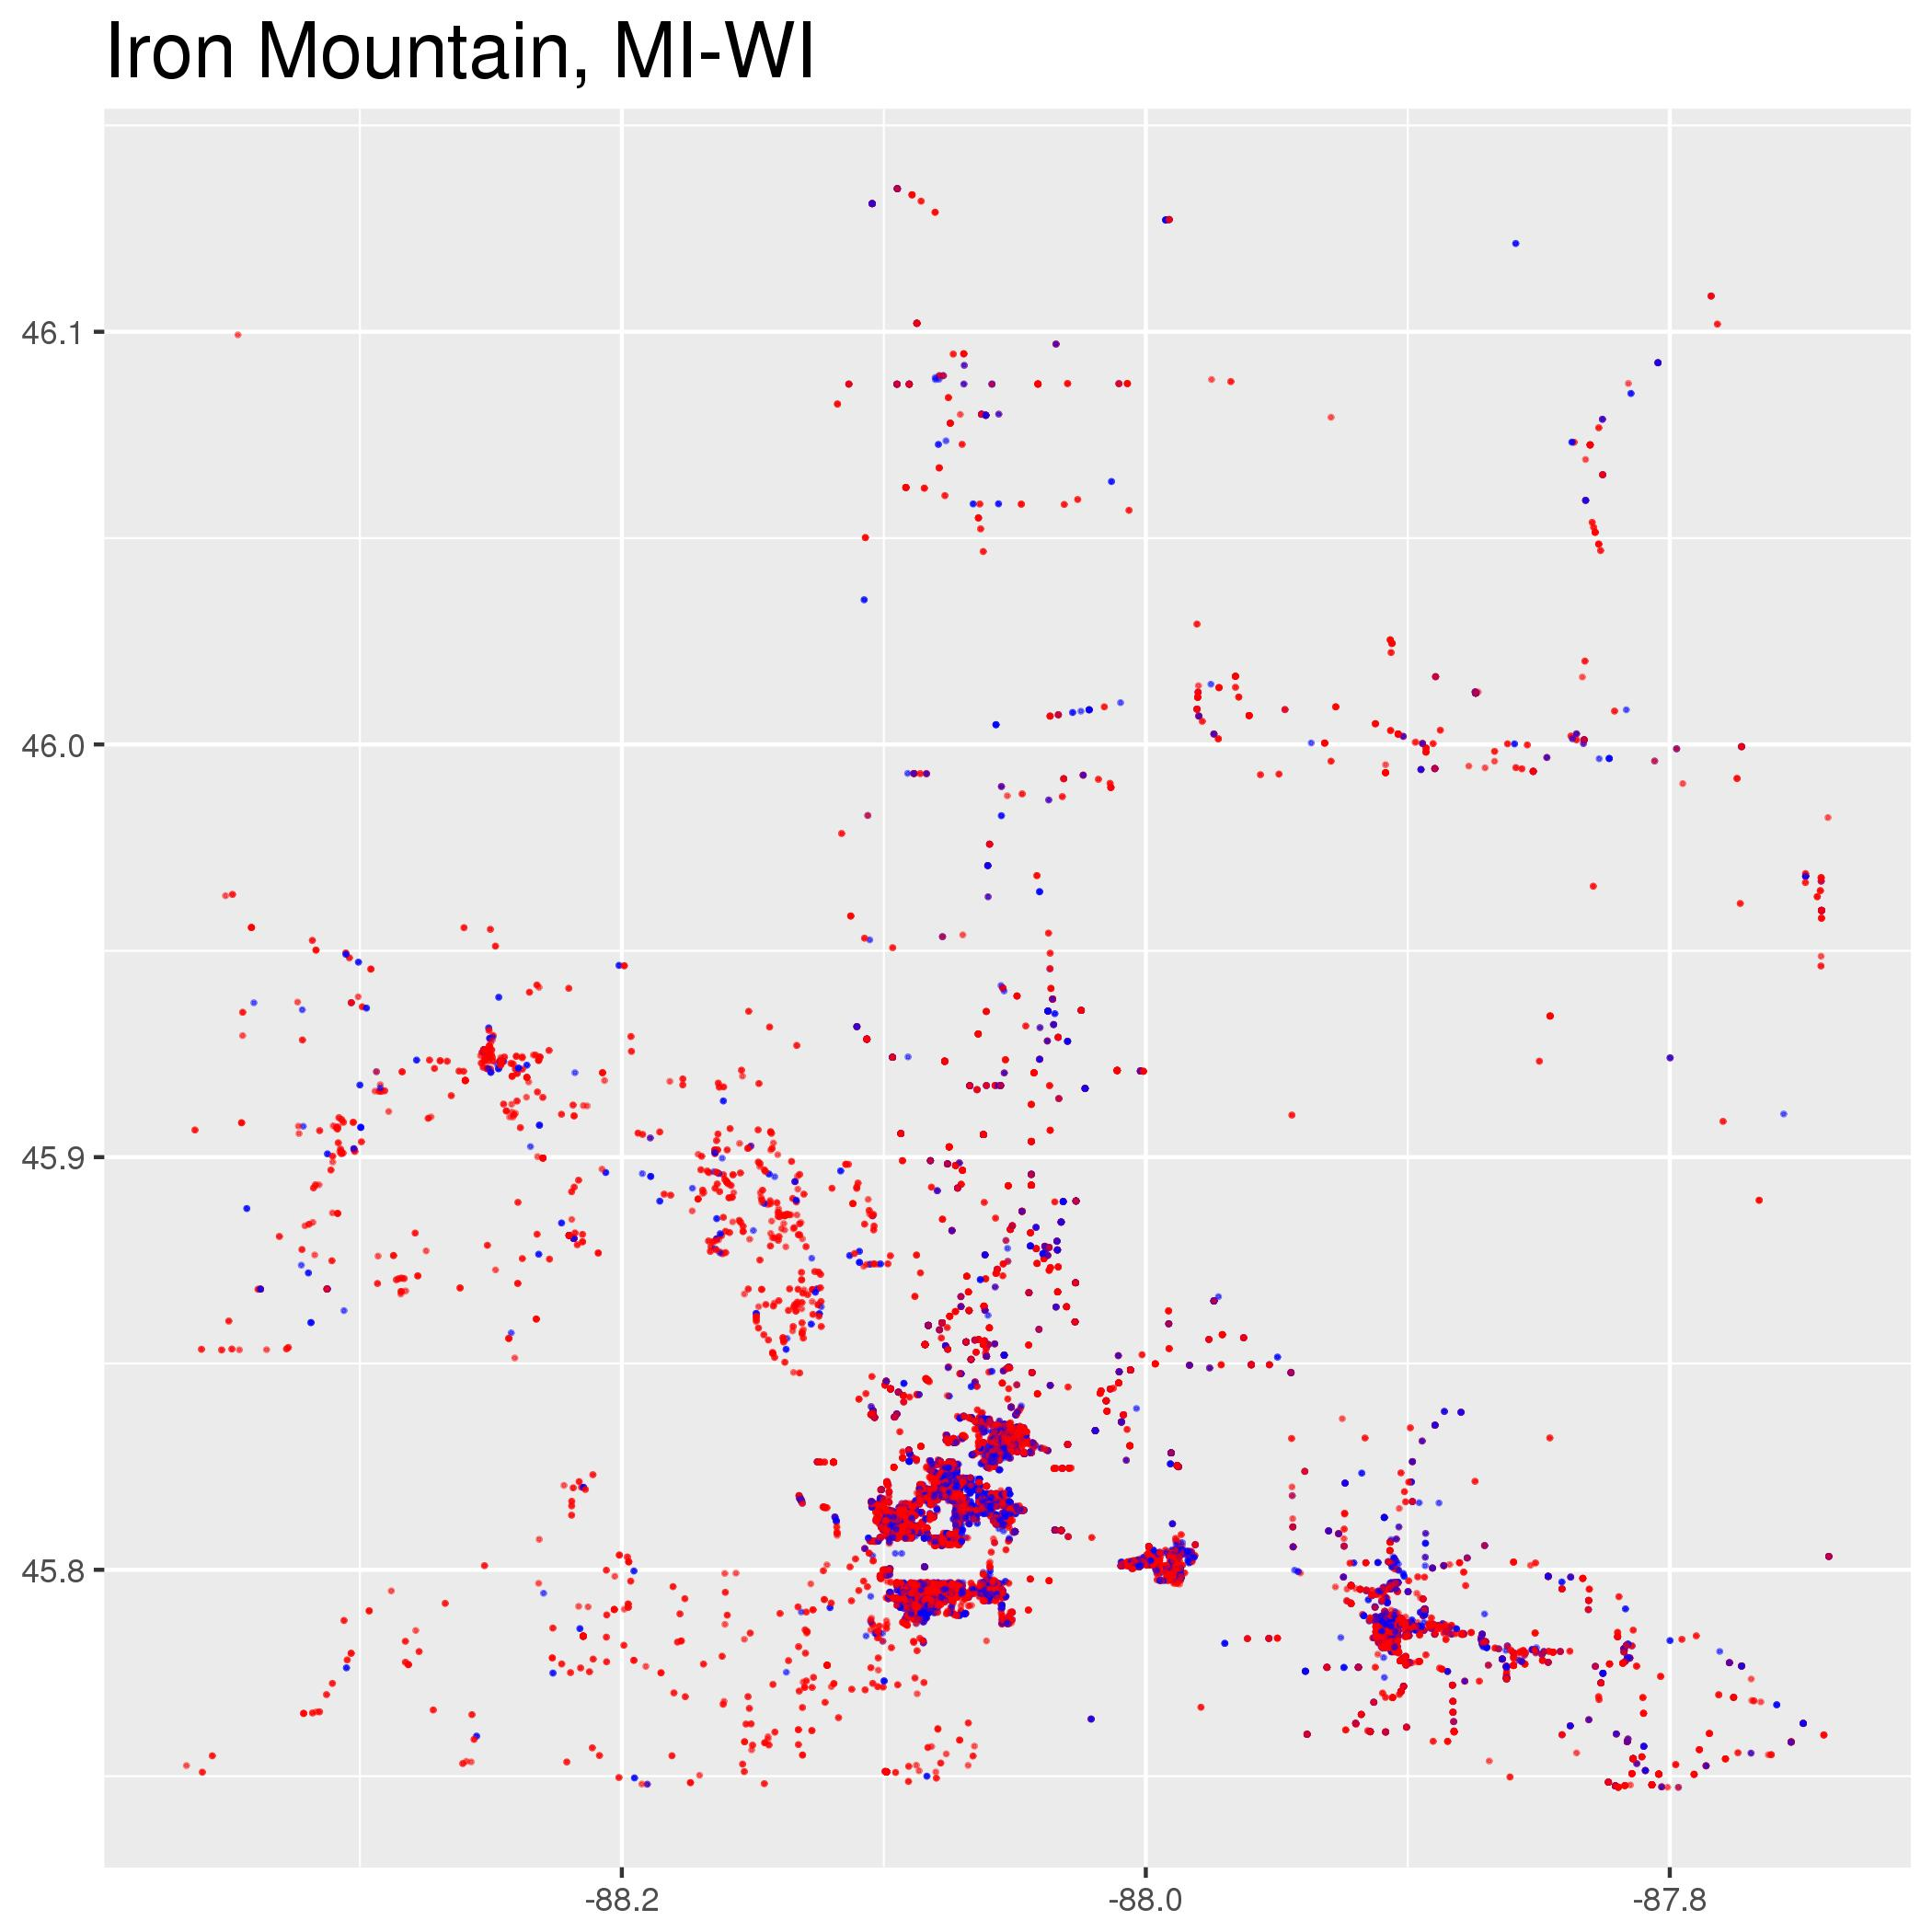 IronMountainMI-WI.jpeg